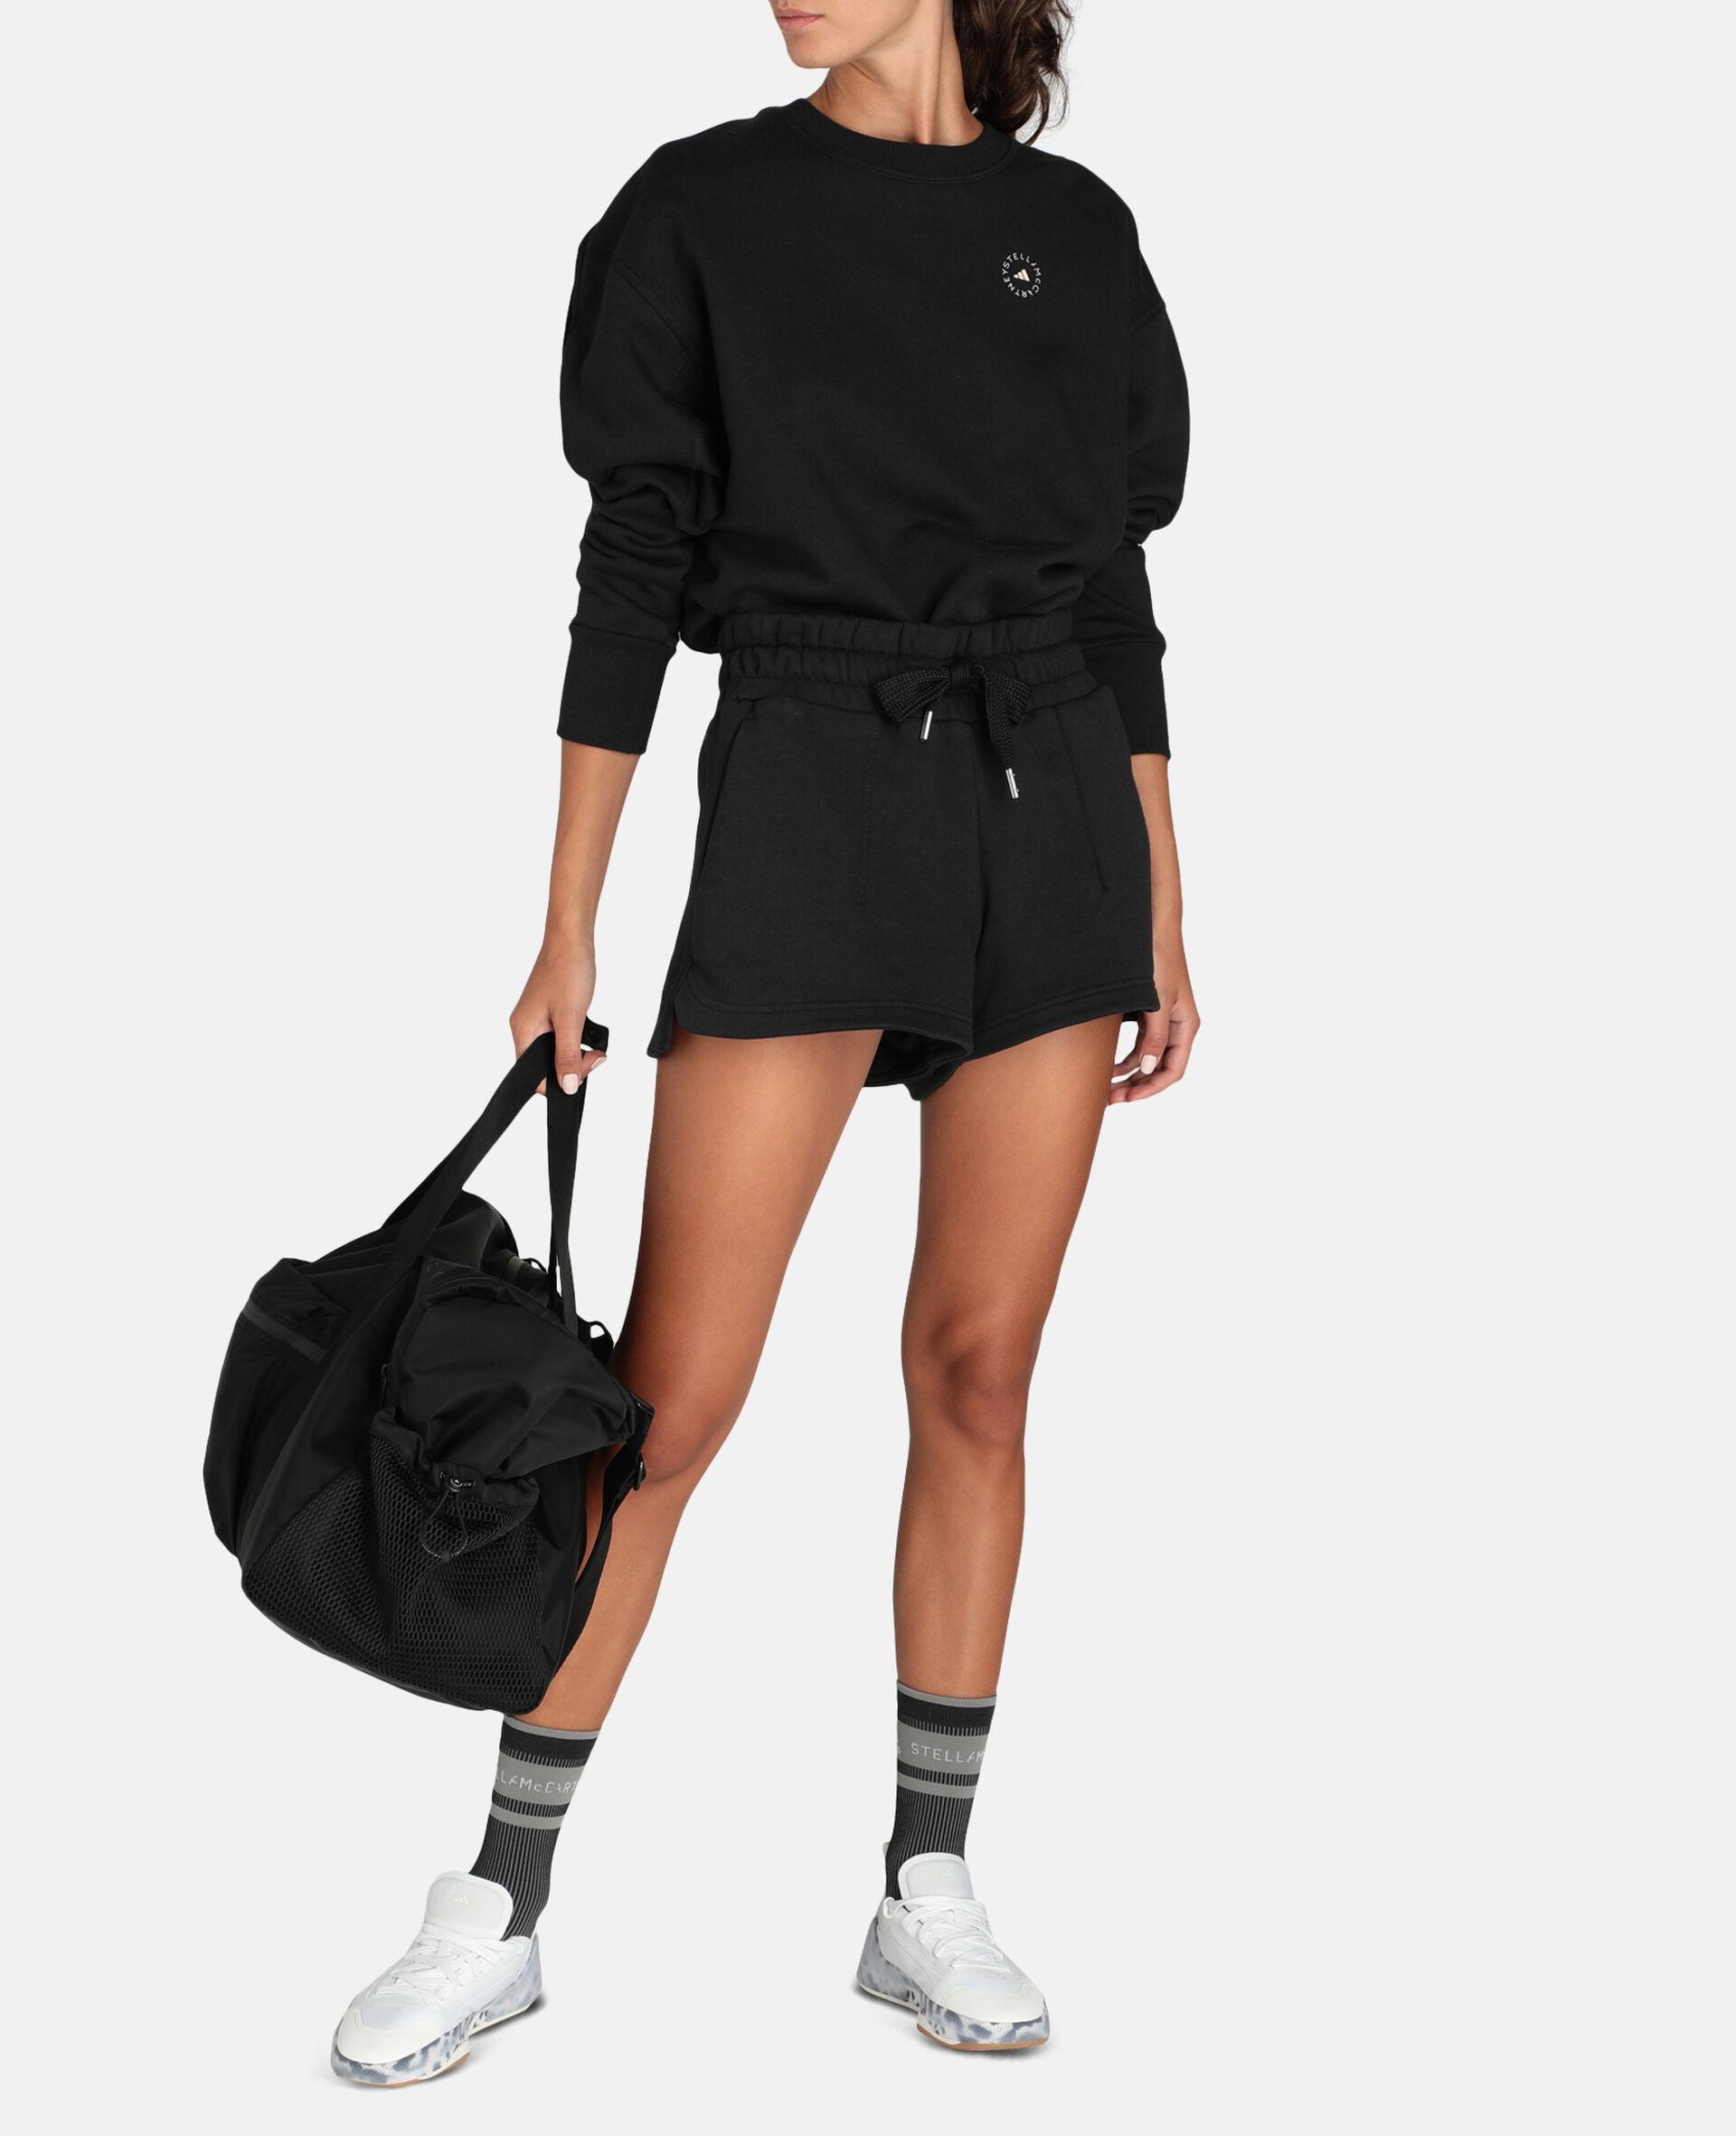 Black Training Sweatshirt-Black-large image number 1